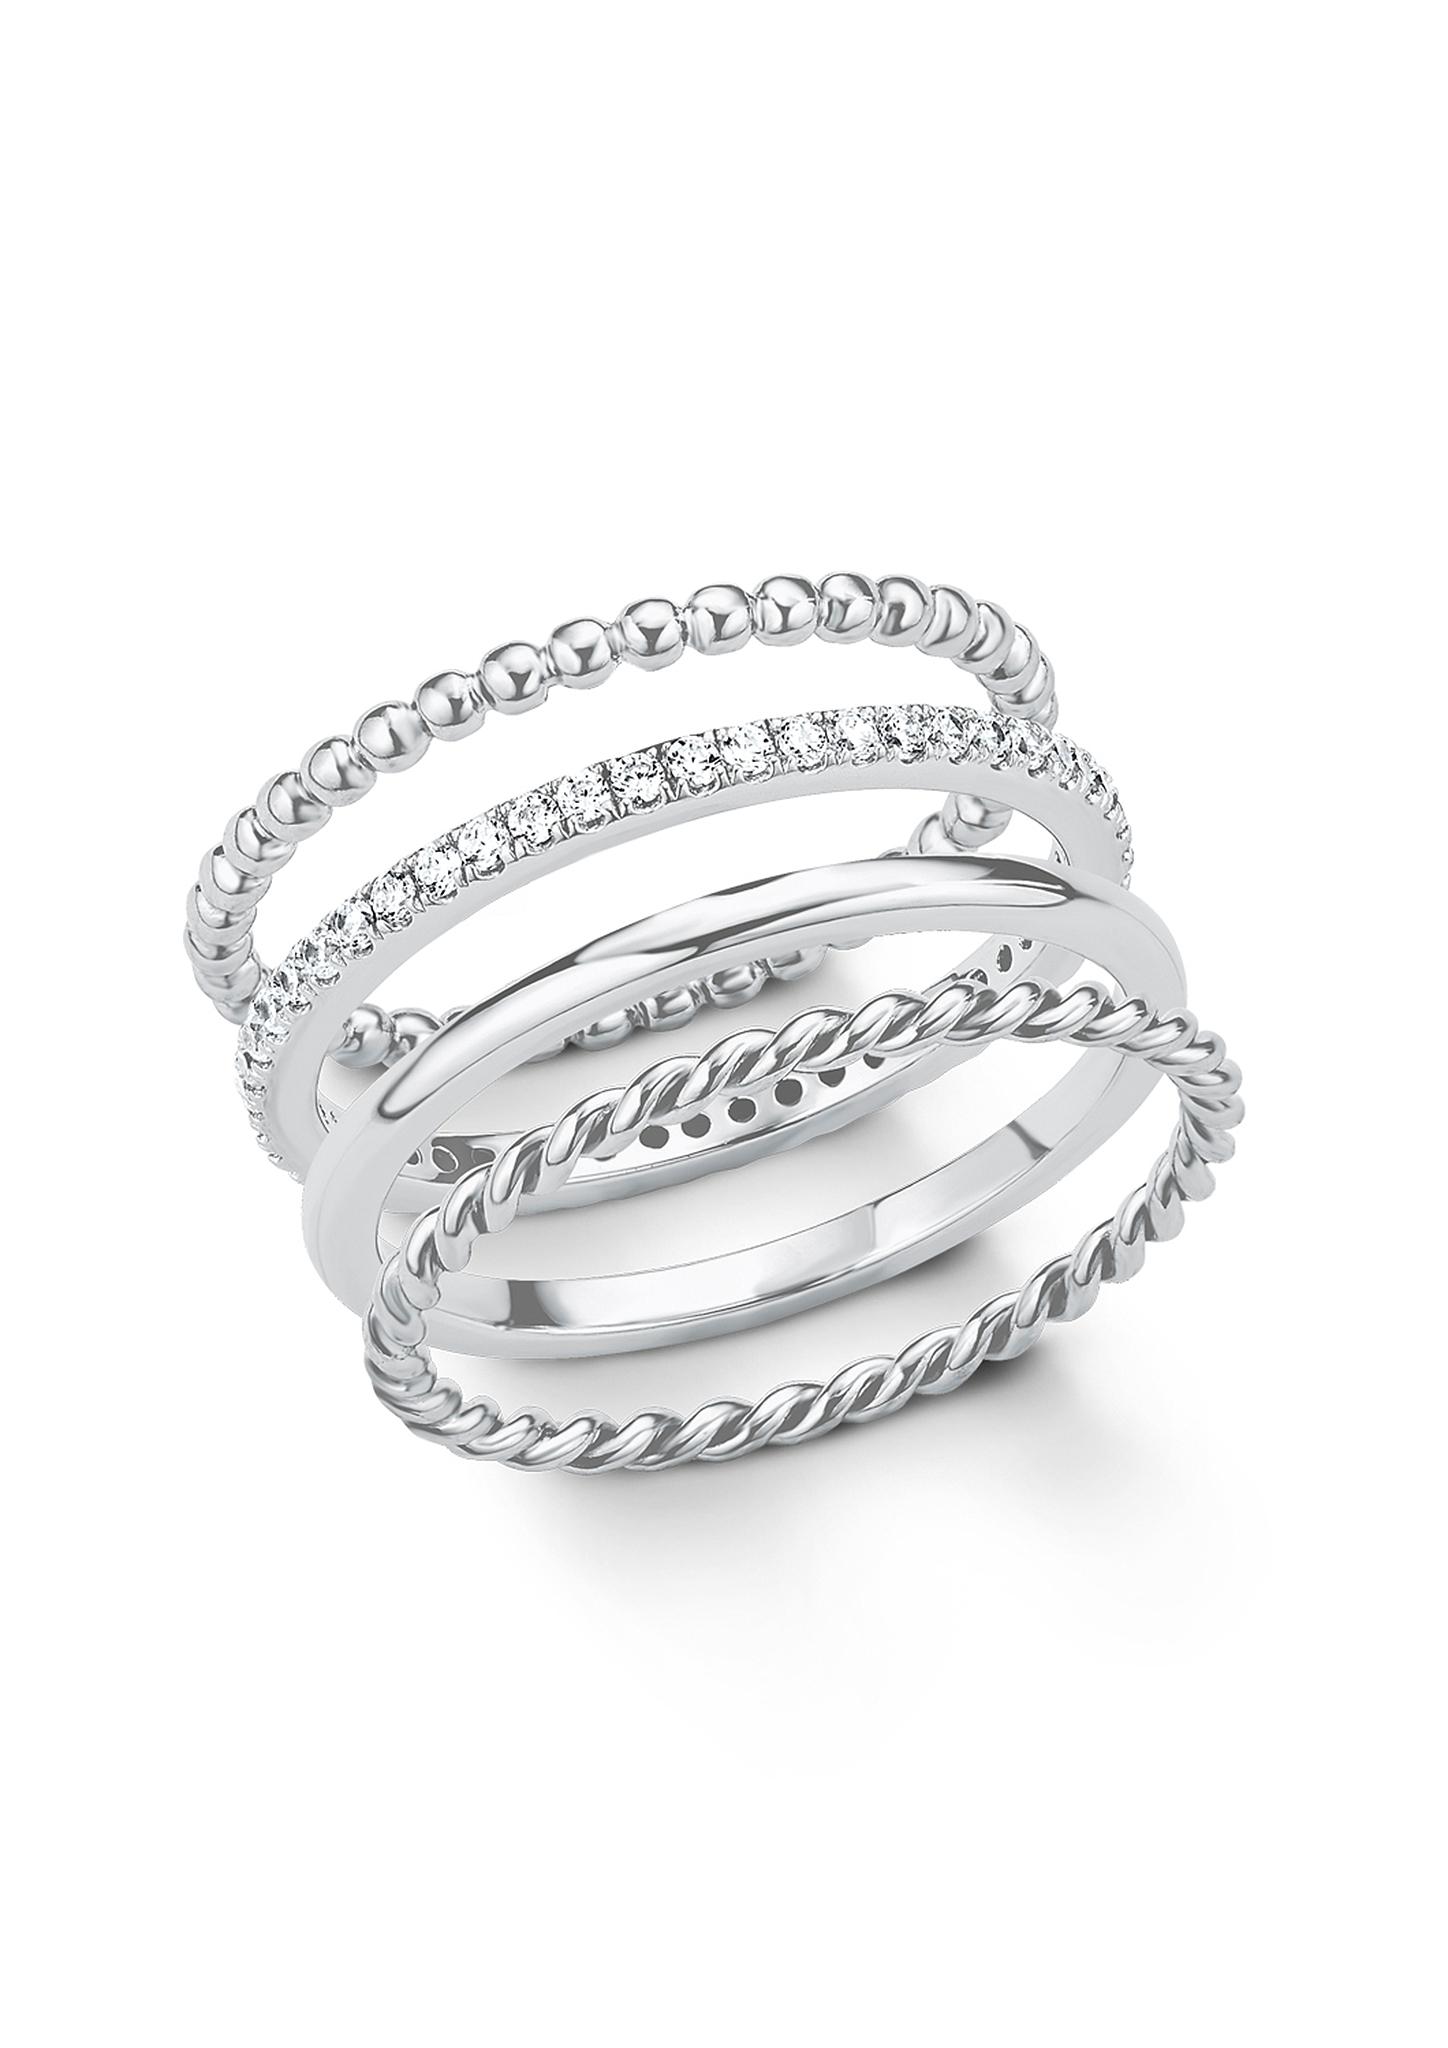 Fingerring | Schmuck > Ringe > Fingerringe | Weiß | 925er sterling silber -  rhodiniert| zirkonia (synthetisch) | s.Oliver